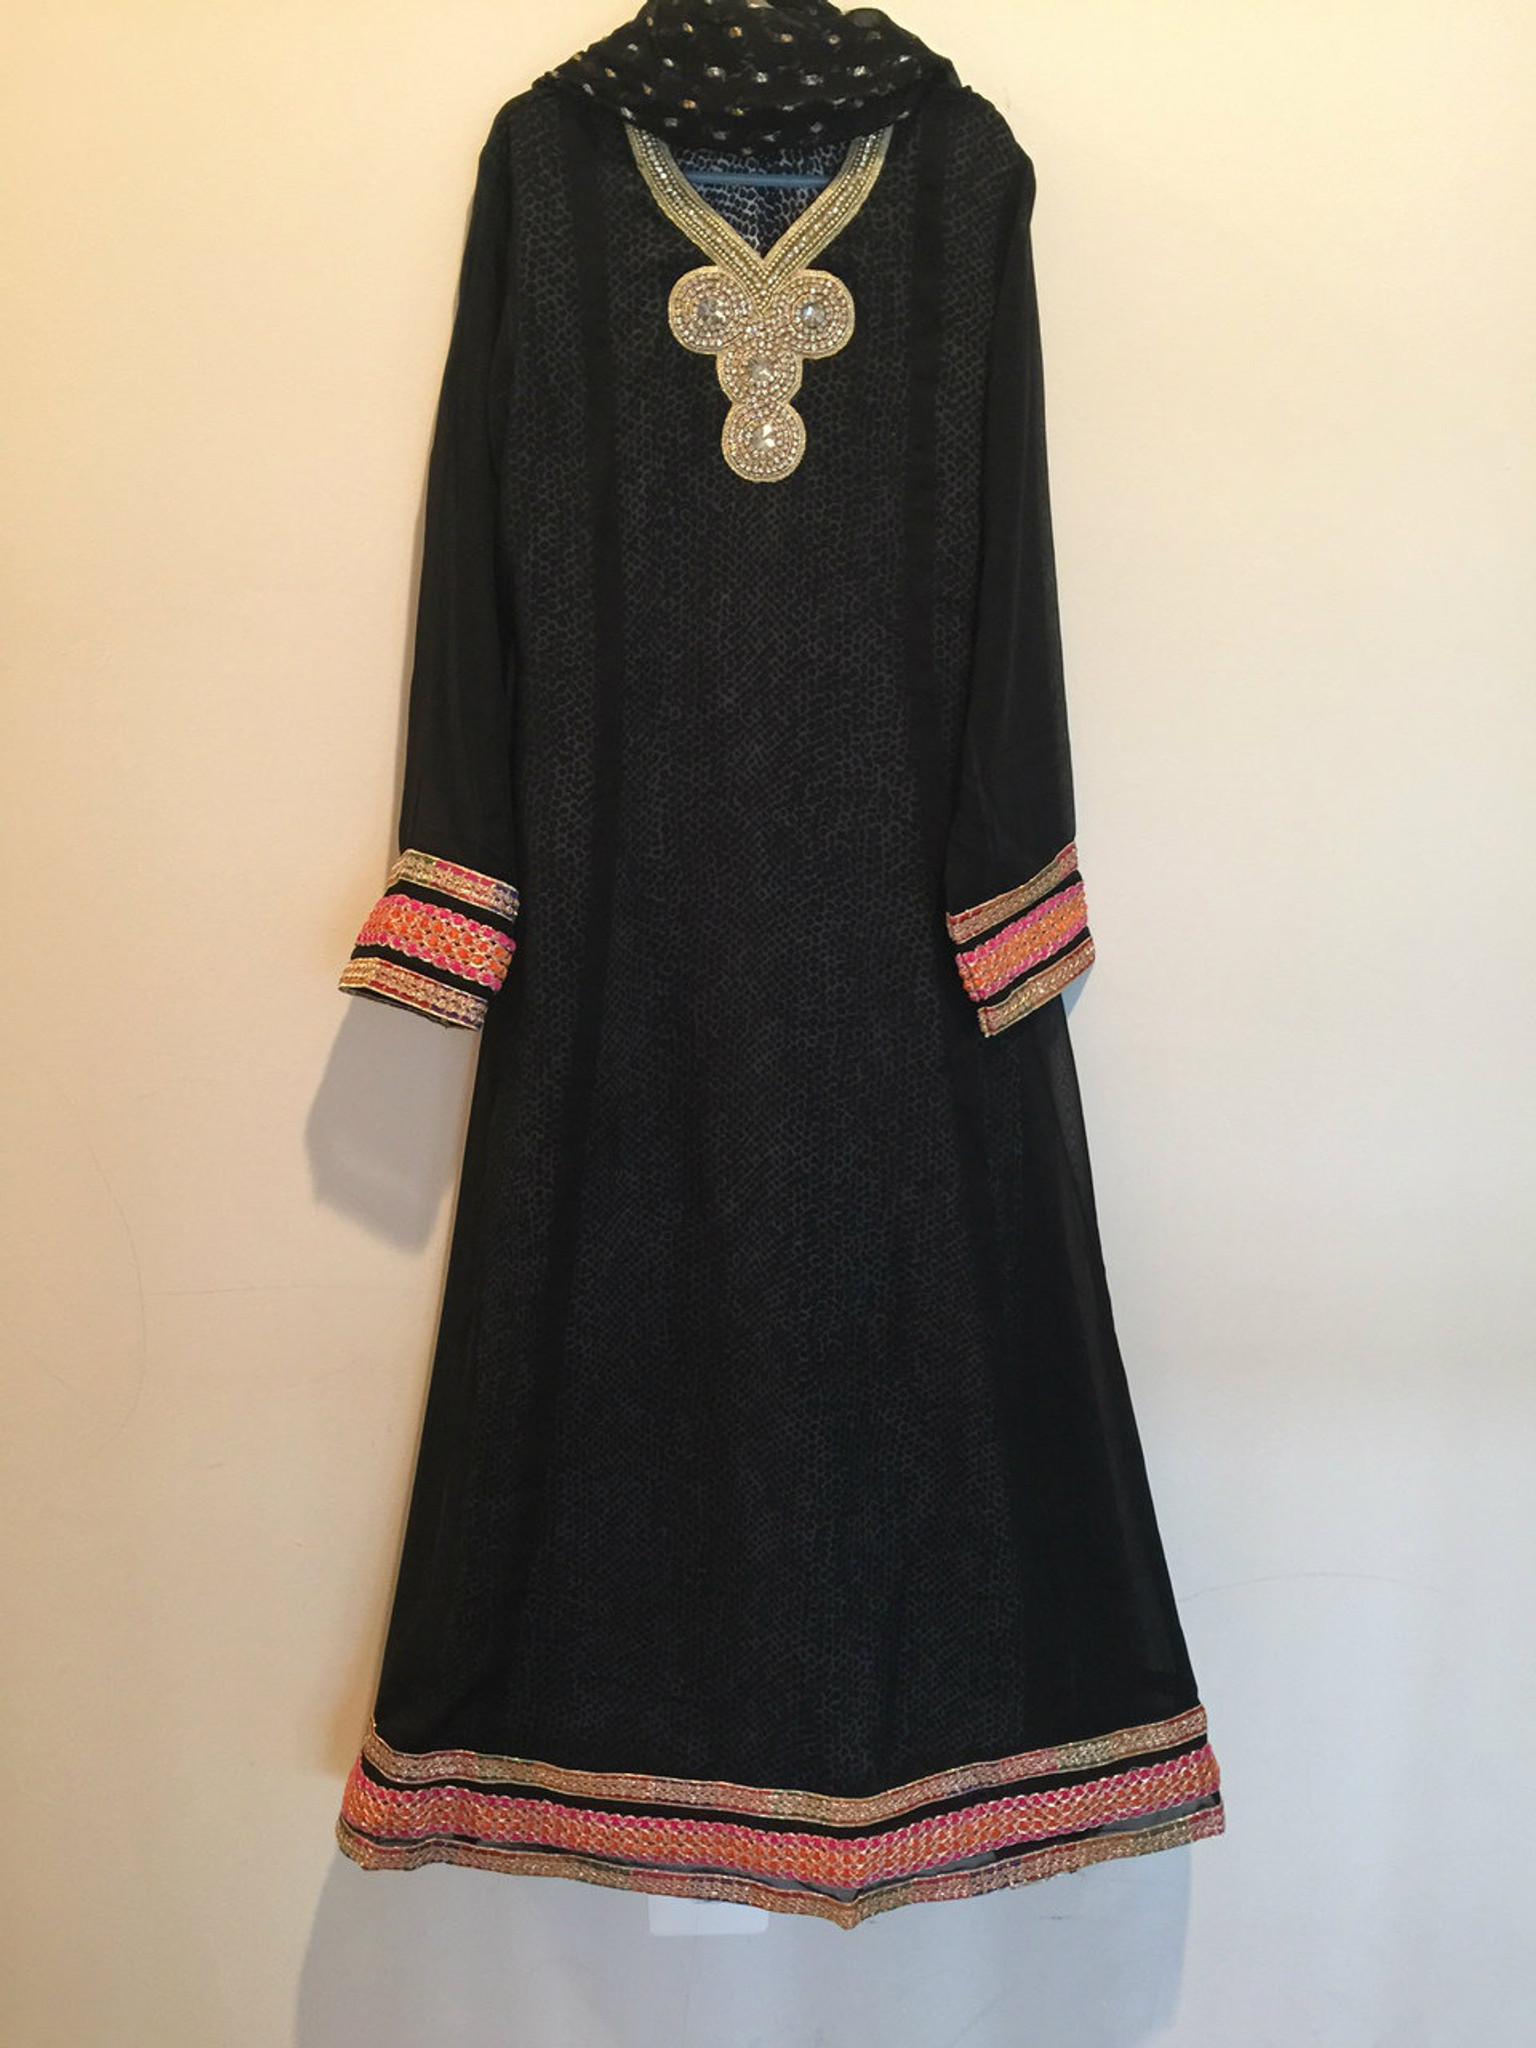 Girls Black Party Dress Age 11/12